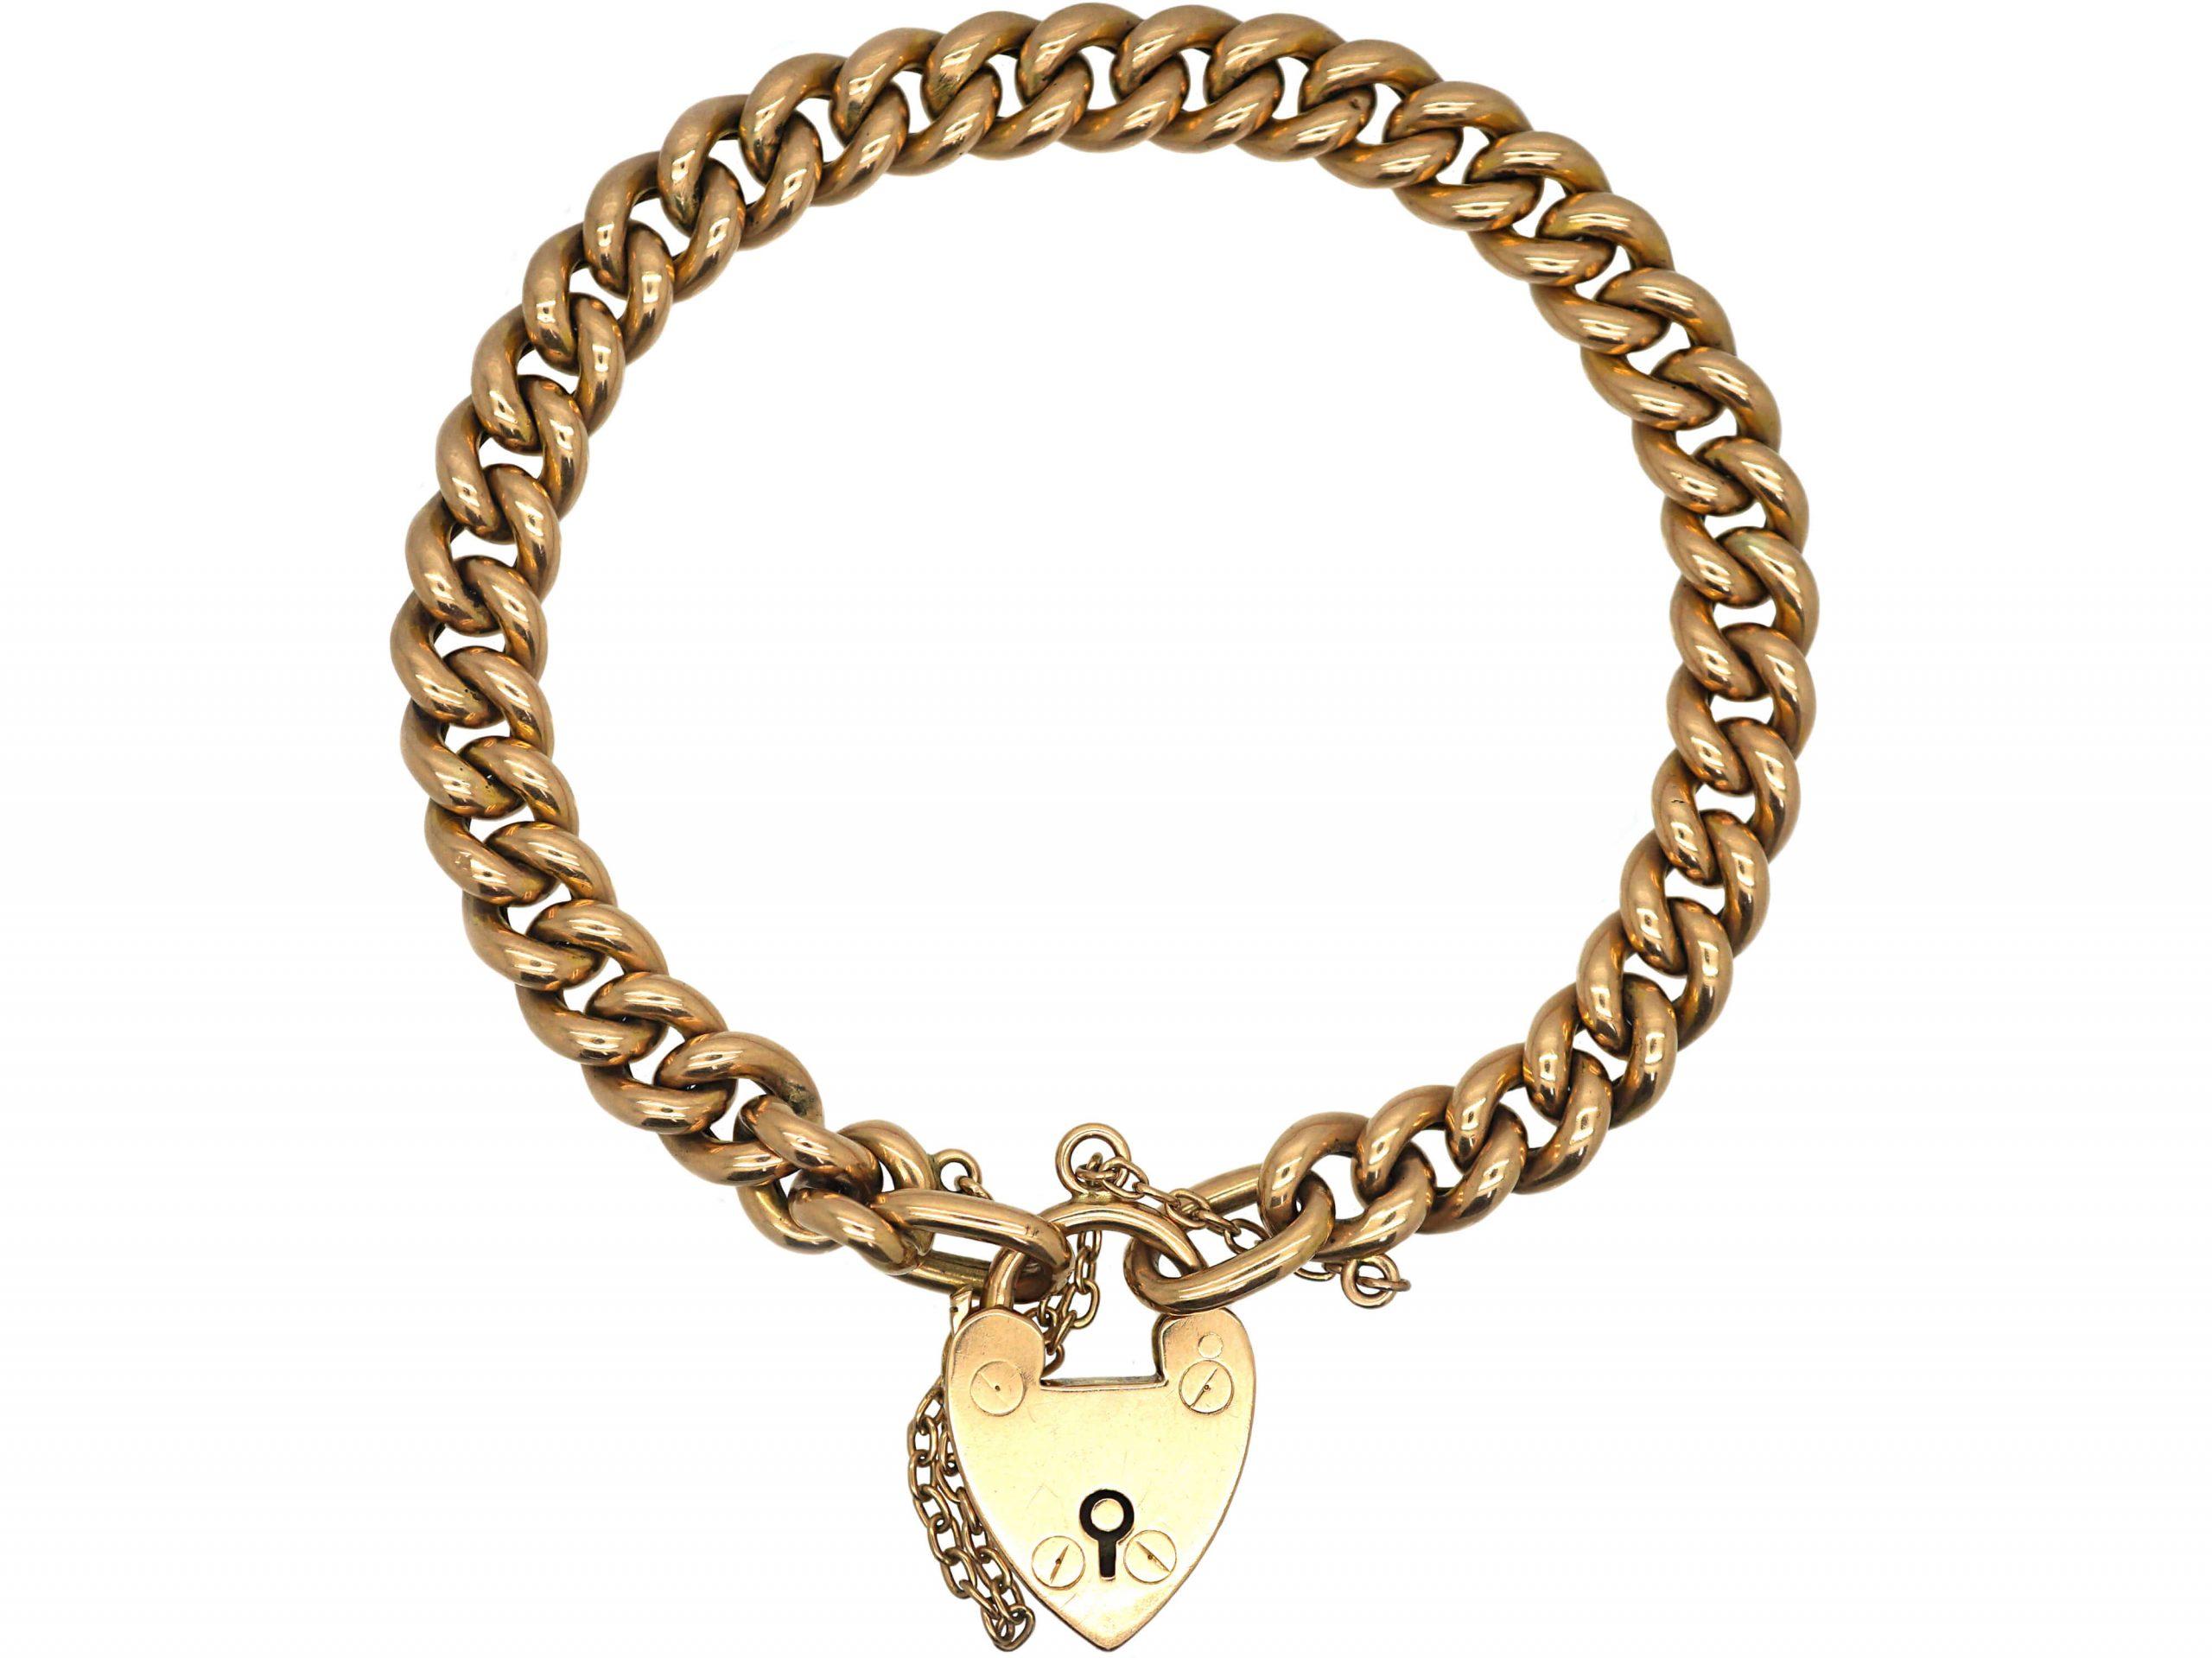 Edwardian 15ct Gold Curb Bracelet with Padlock